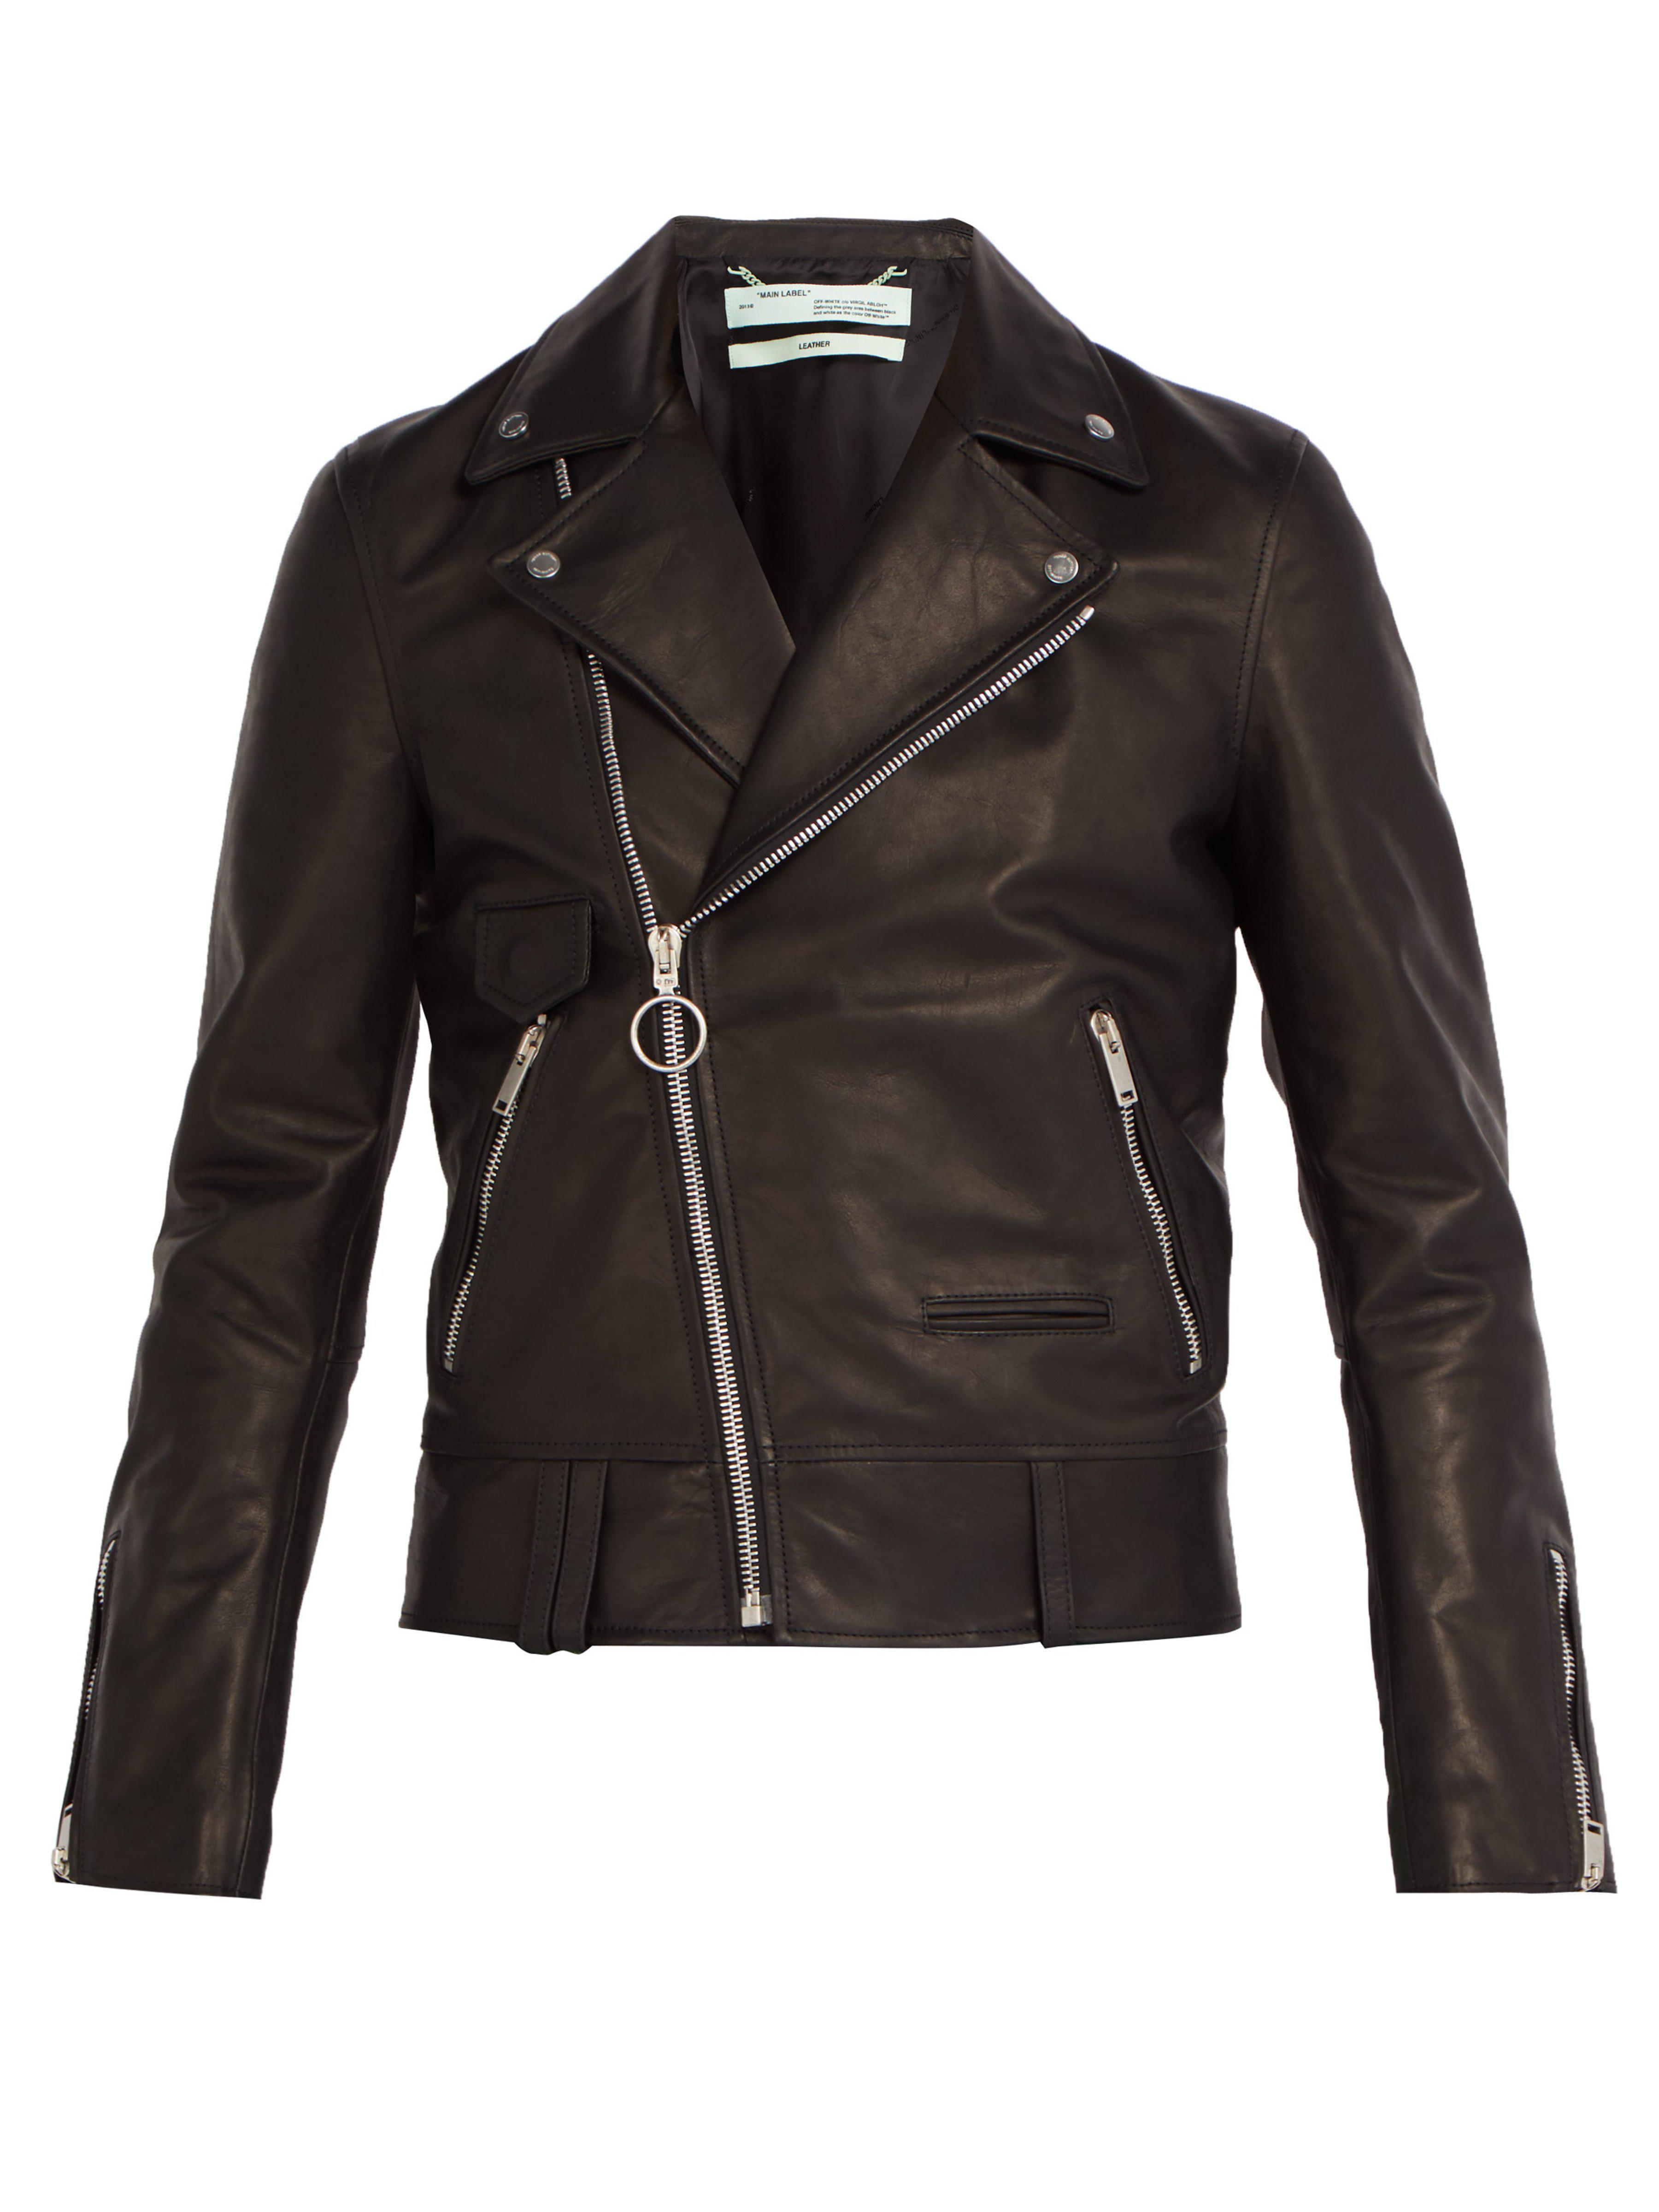 344f99295e3 Off-White c o Virgil Abloh 99 Logo Print Leather Biker Jacket in ...